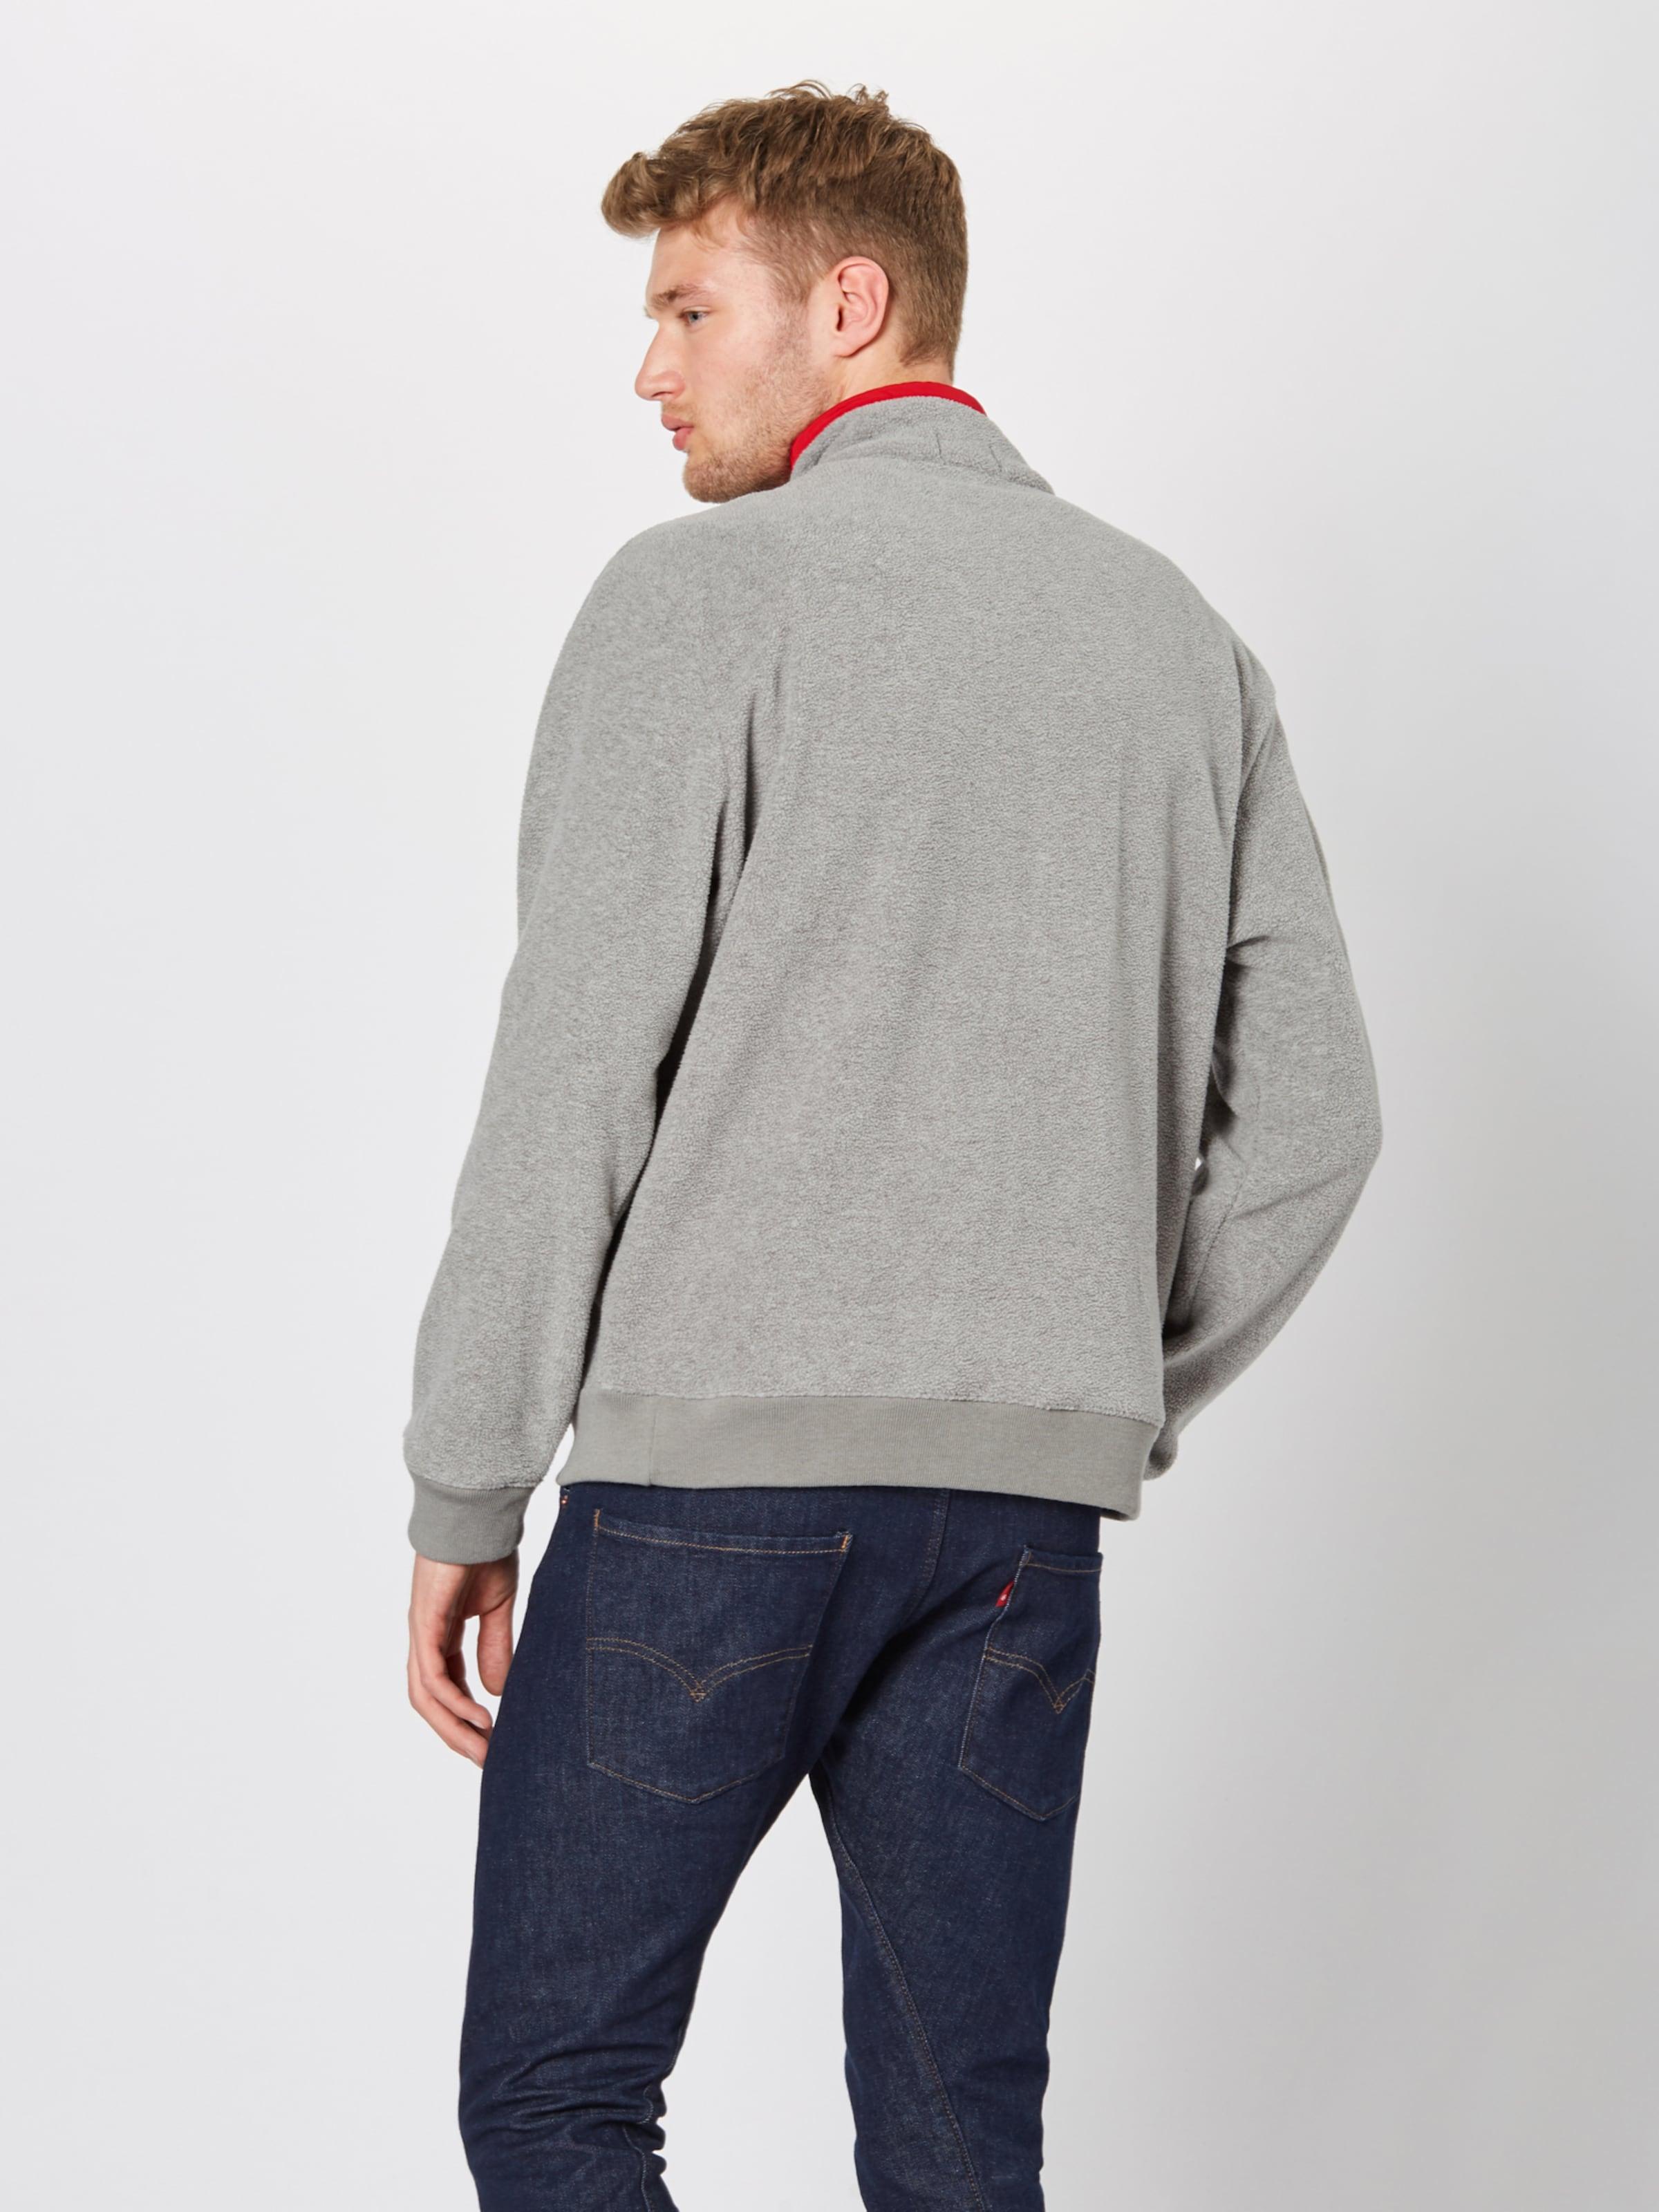 Polo knit' 'lshzm1 Dunkelgrau In long Sleeve Ralph Sweatshirt Lauren kTZwXOPui